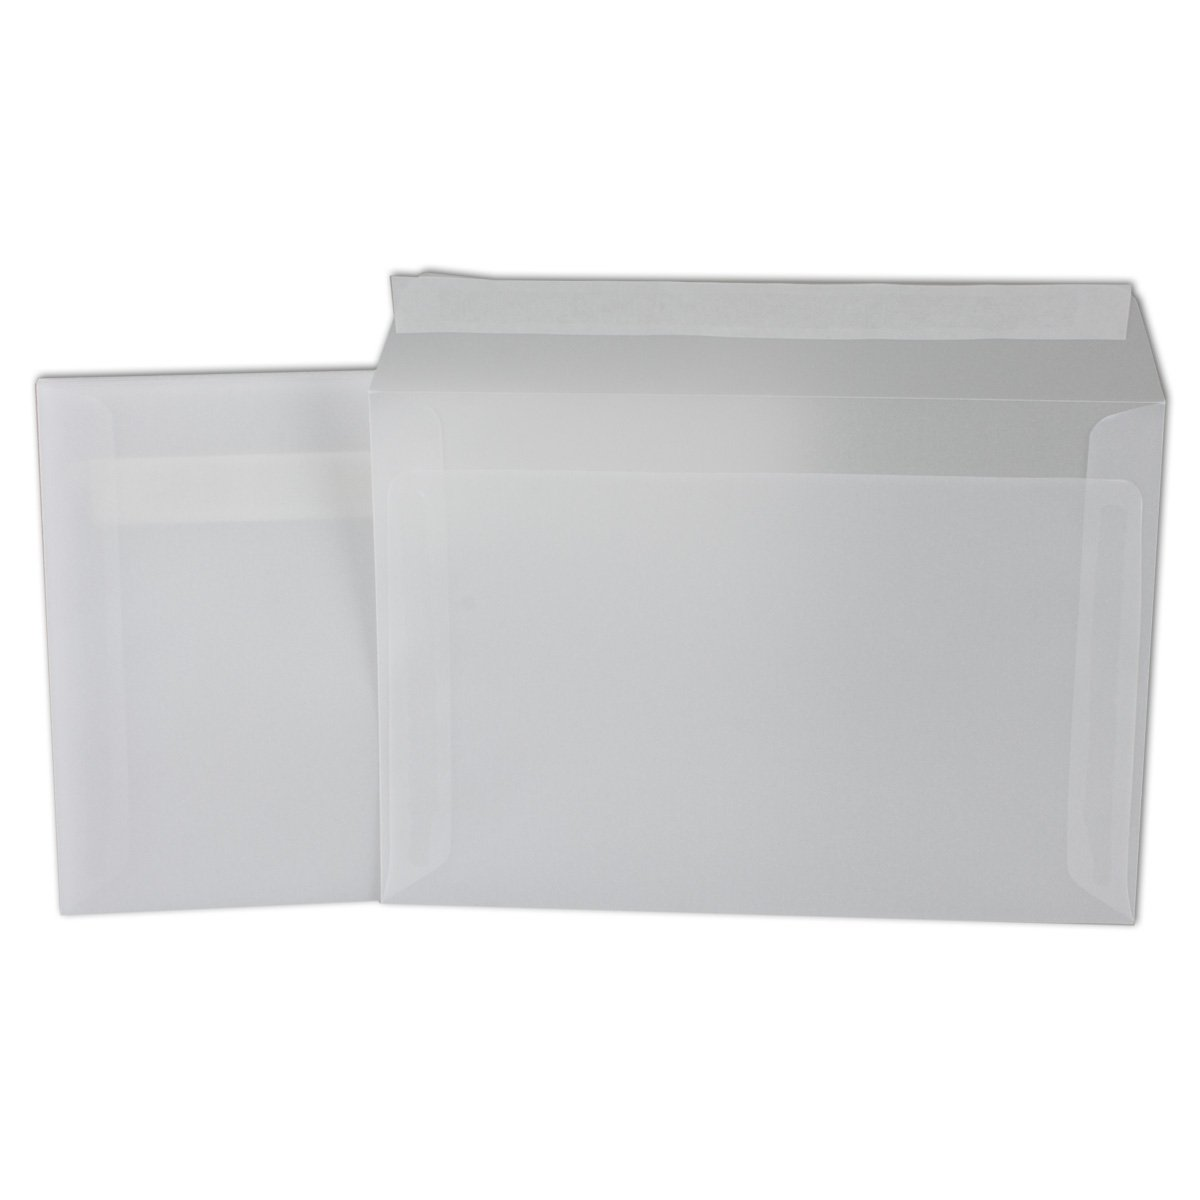 formato DIN C6: 11,4/x 16,2/cm 92/g//m/² 25 Umschl/äge Bianco//Trasparente chiusura adesiva Buste trasparenti colore bianco